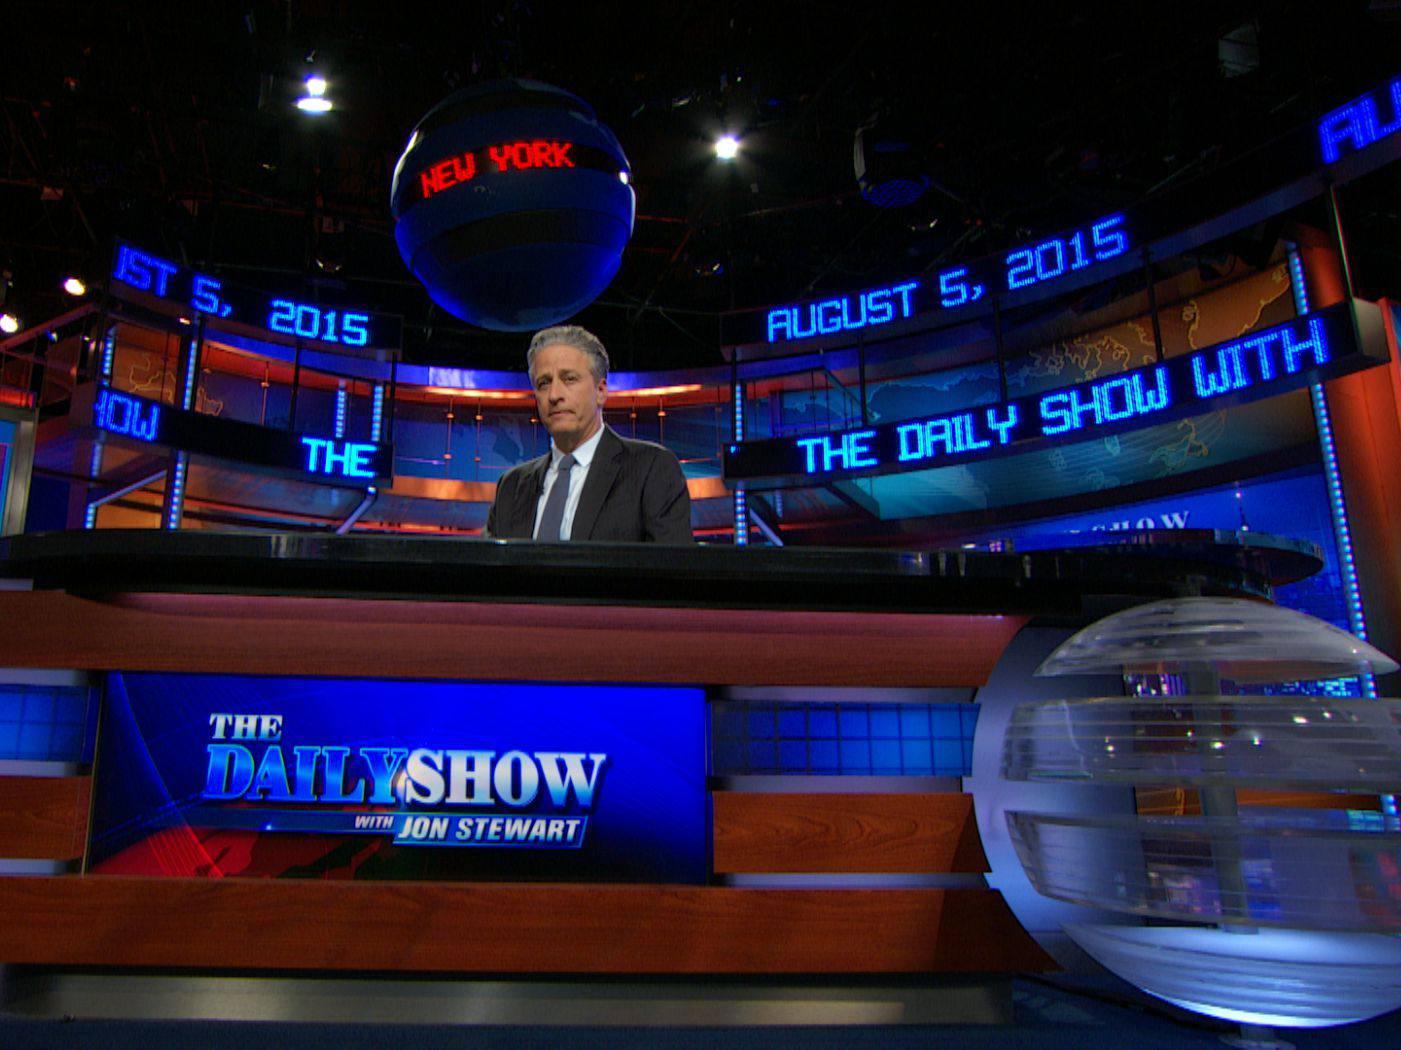 The Daily Show con Jon Stewart ambientado en The Newseum